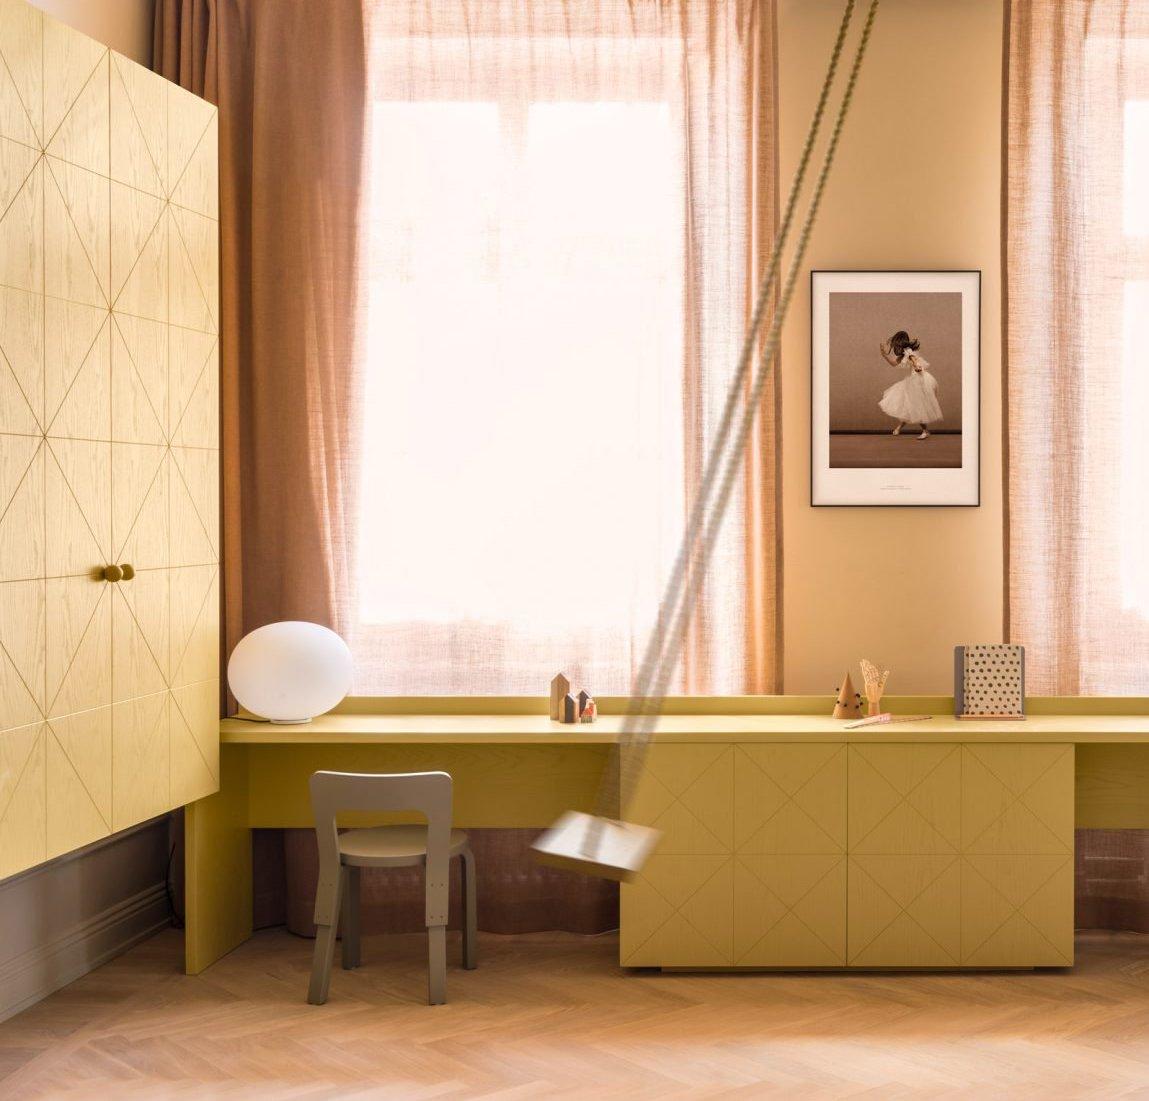 couleur vert amande appartement deco. Black Bedroom Furniture Sets. Home Design Ideas